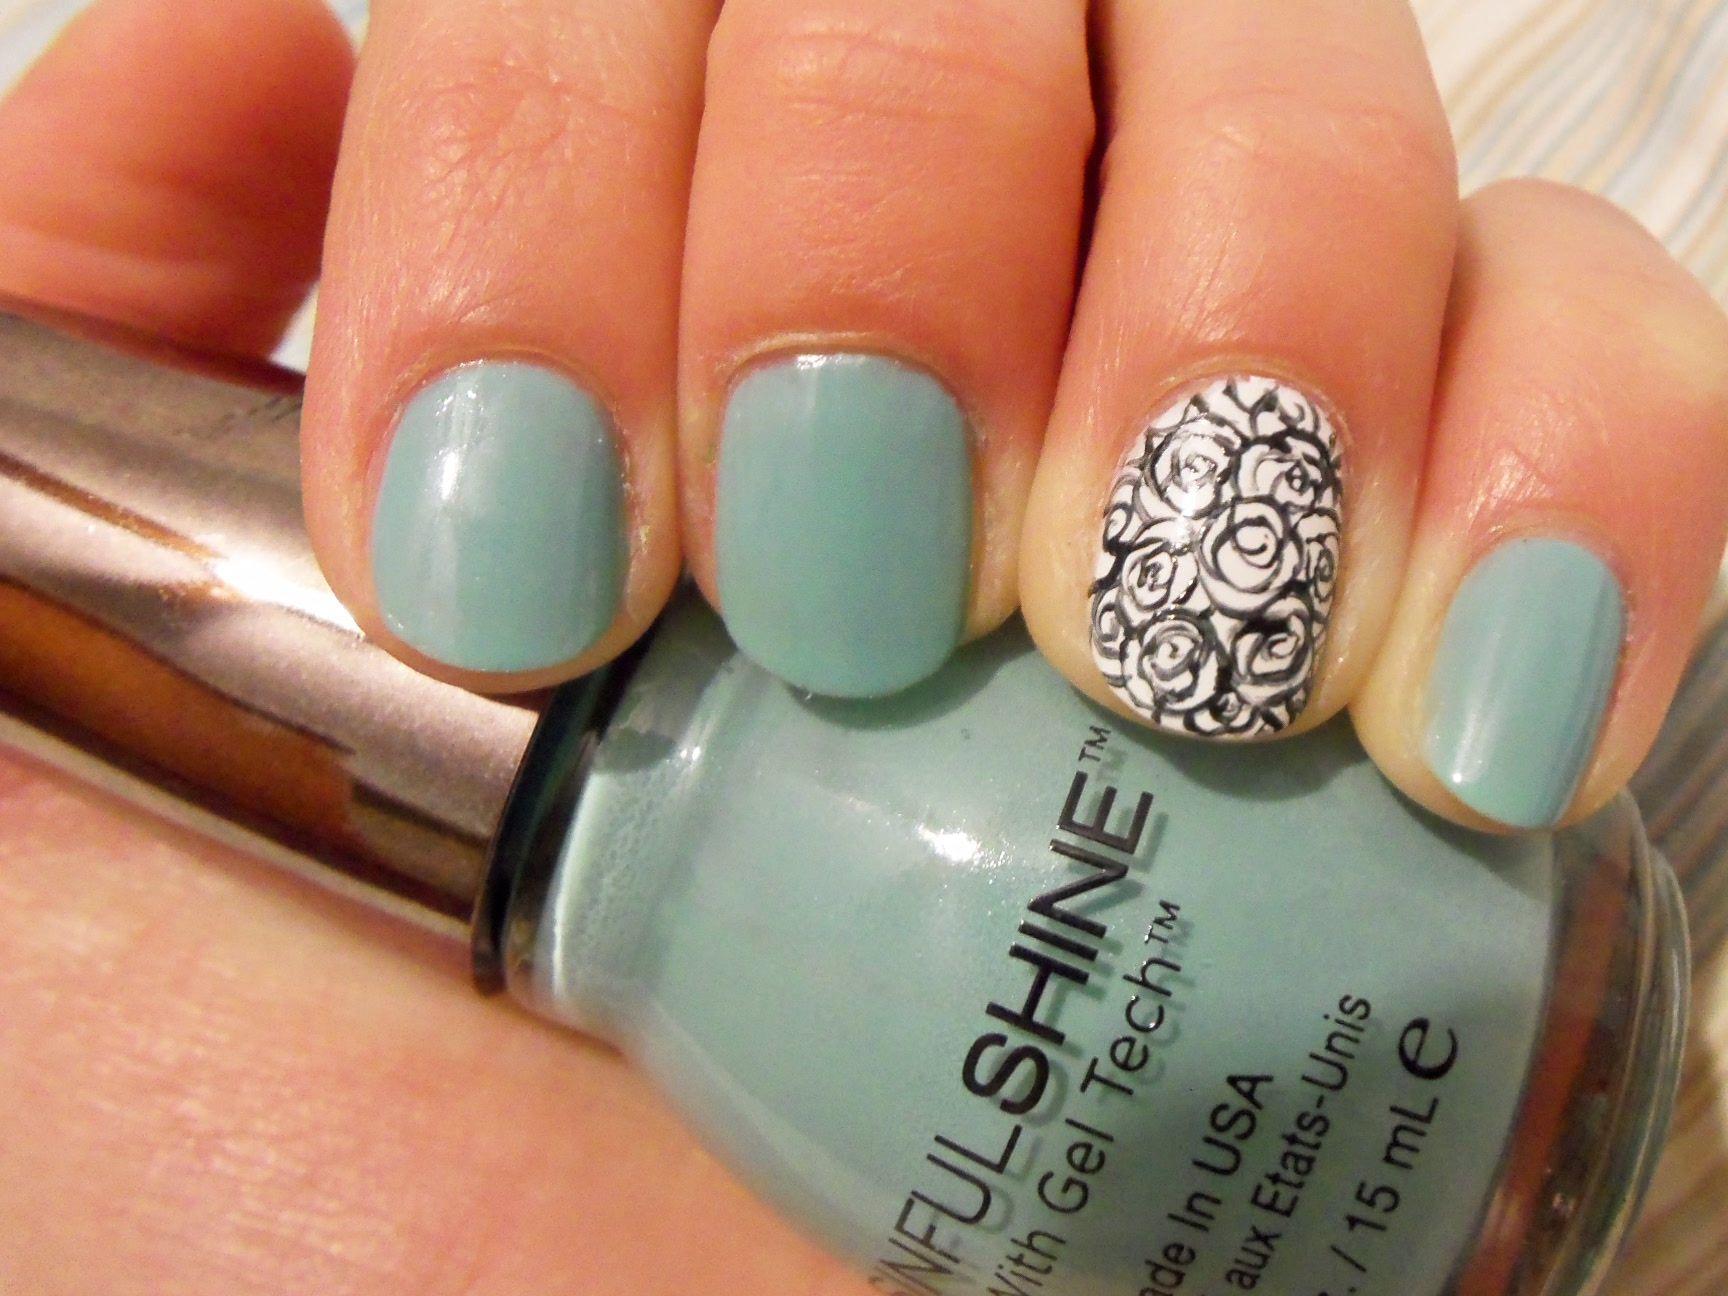 Miniature rose nails using Sinful Shine-Rendezvous #sinfulcolors #blackandwhite #essieblanc